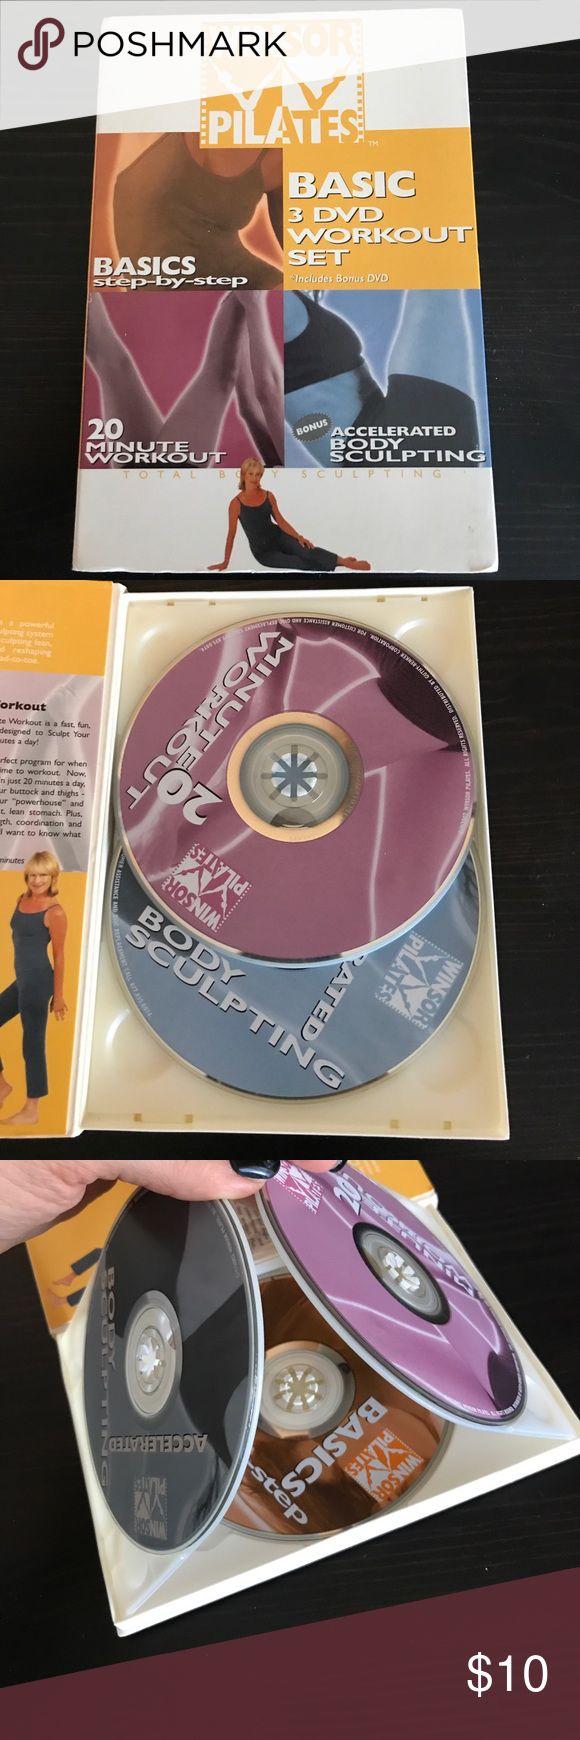 3 disc Windsor Pilates DVD set Complete 3 disc set Winsor PilatesDVDs. Good condition, no skips. Other